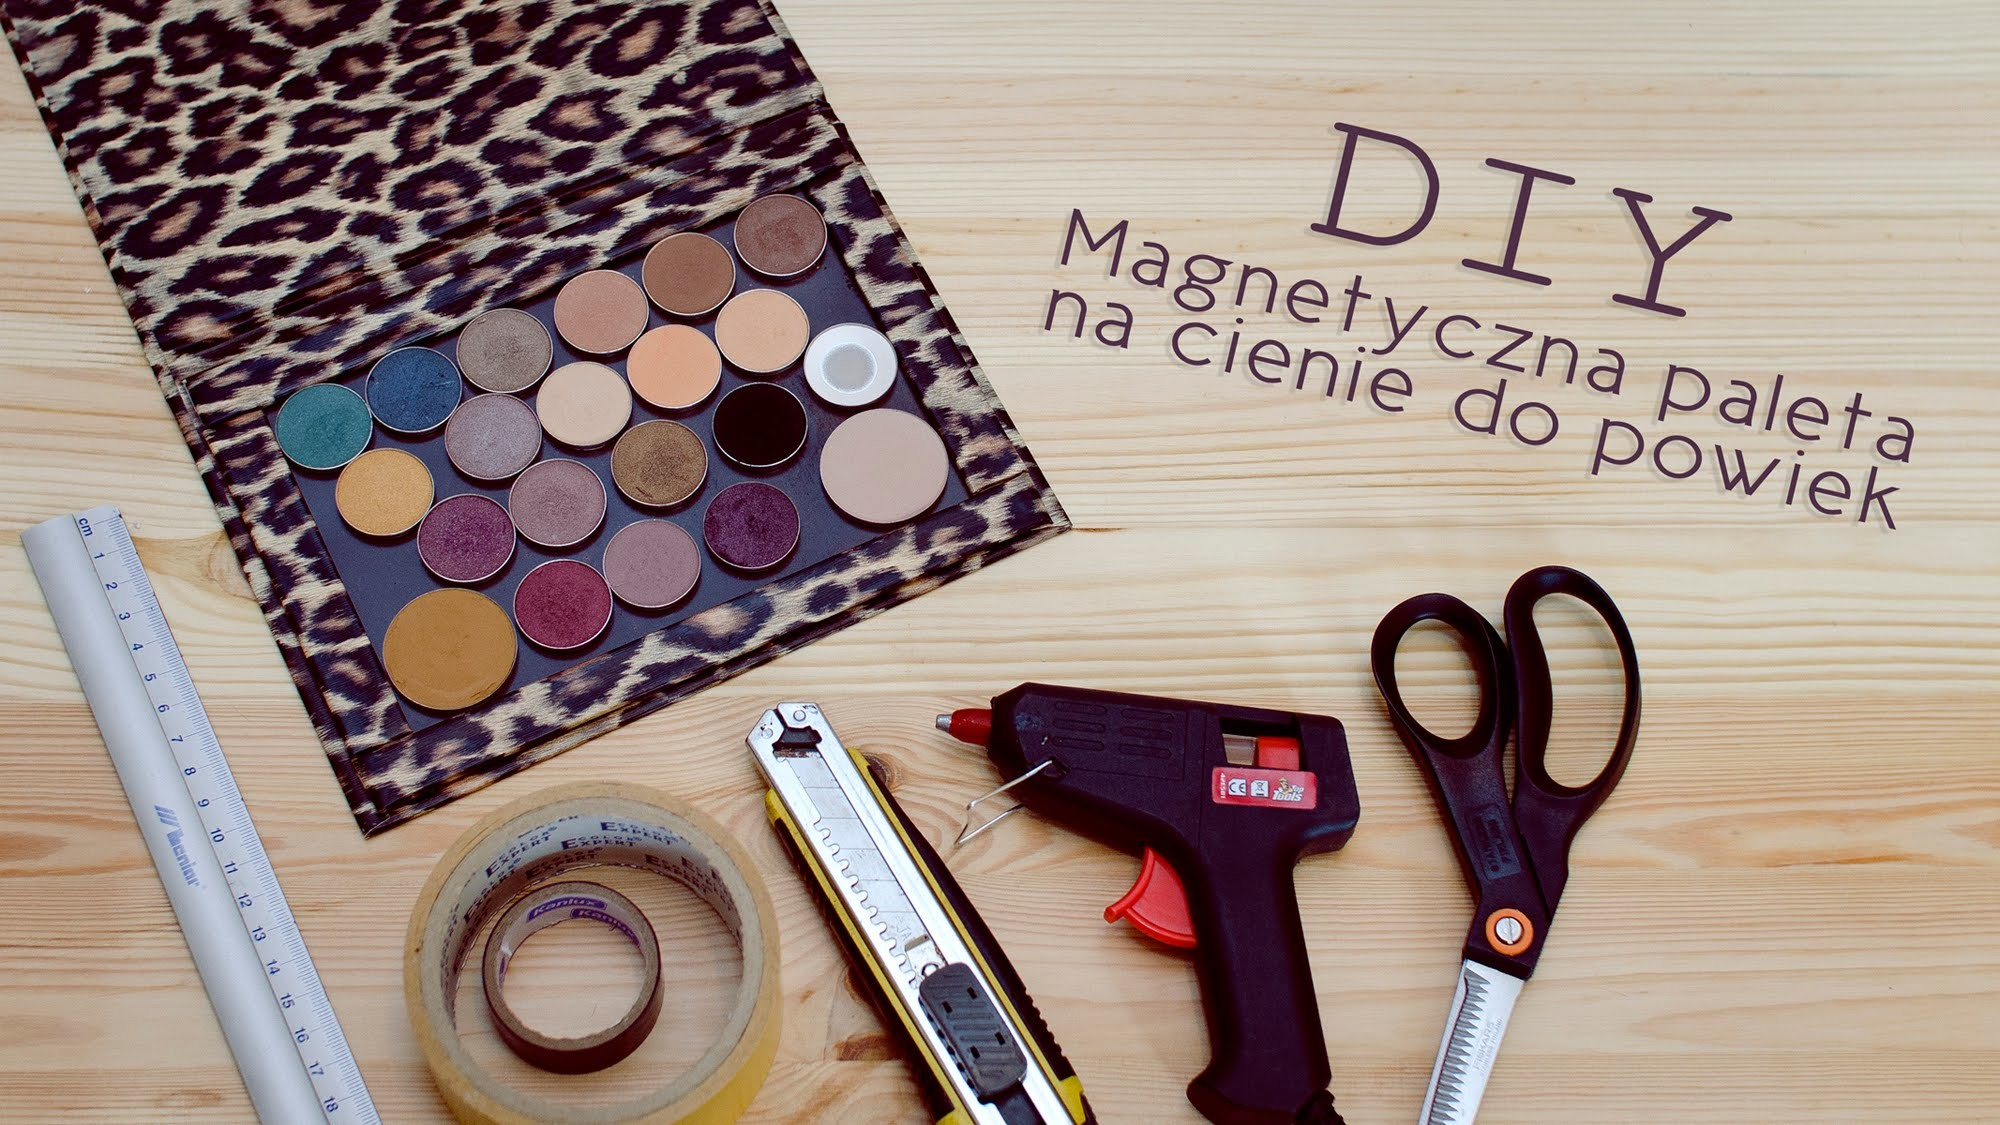 DIY ** Magnetyczna paleta na cienie do powiek ** a'la Z Palette